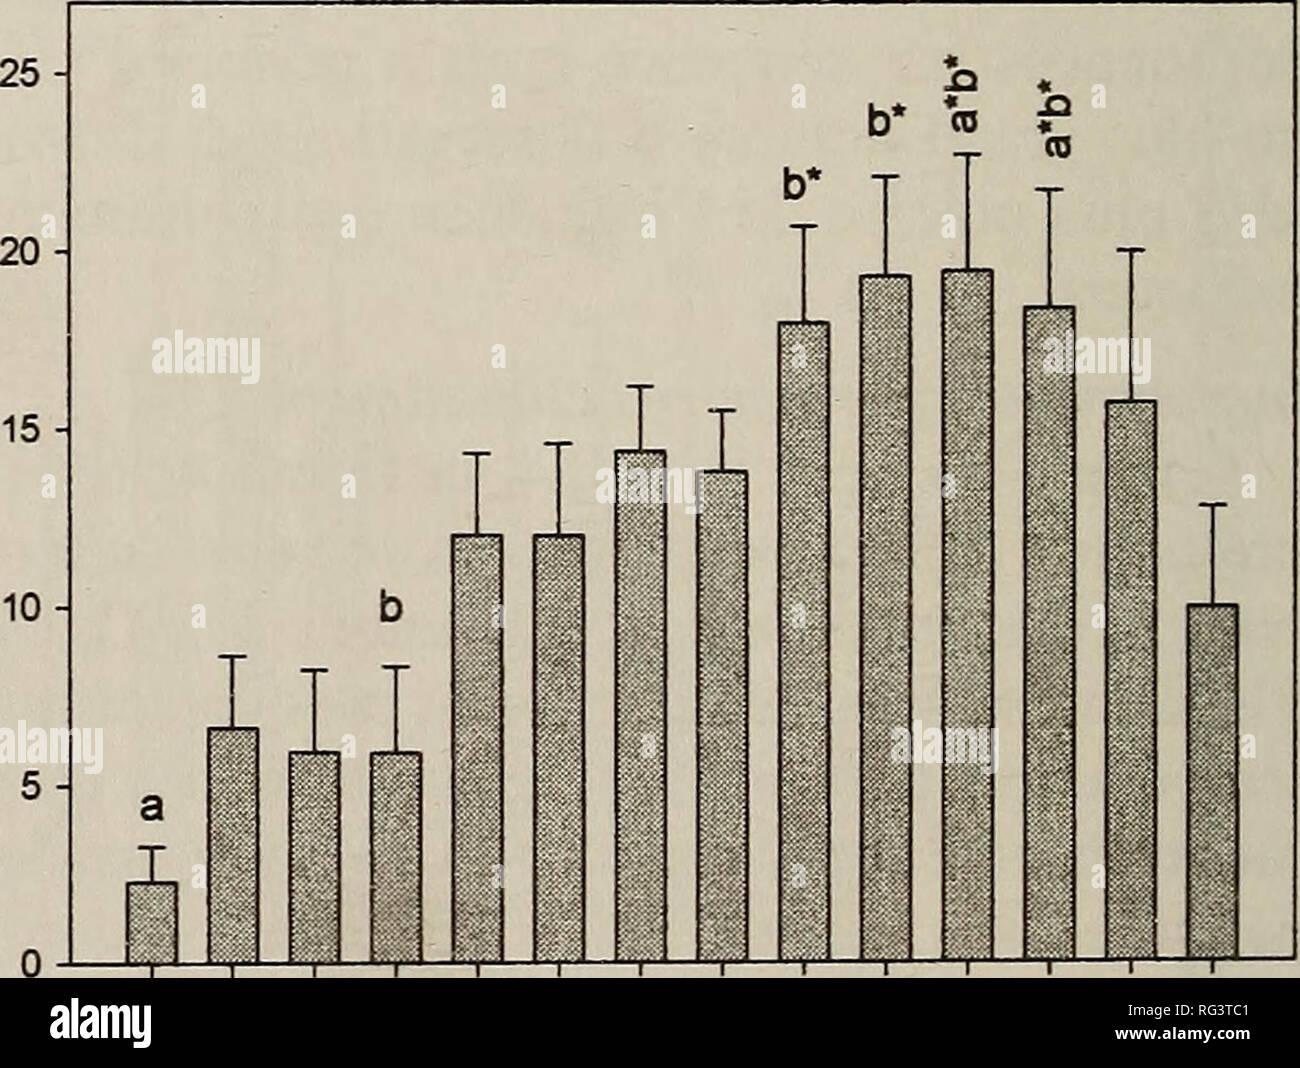 ". The Canadian field-naturalist. Natural history. Humidite relative (%) o E 35 30 25 > CO X ^J 20 - 15 10 - n a b c I d ± e J_ * 'ST ""8 CO 1 ""ST ""8 n co I I ^9 /=tf> ^> ^ 'V ^ 6"" ^ 10 Vitesse du vent (km/h) 40 35- 30 O E -0J 25 > CD X 20 15 10 - 5 - J-^ co O J-^ 53 -r h* a ill I I"" ' I ' "" I ' ""I jl 1 I '' '"" I ' '' I ' ' T ' s *y> * * 9- * 9"" ^ 7^ '^ ^ ^ Ecart d'humidite relative dans la sous-pericxle (%). ^^ *****  Ecart de pression barometrique dans la sous-periode (hPa) *w ** %,*?. ^^ ^^ A /7 ,^tf ^^ ""V Figure 4. Taux d'activite  Stock Photo"